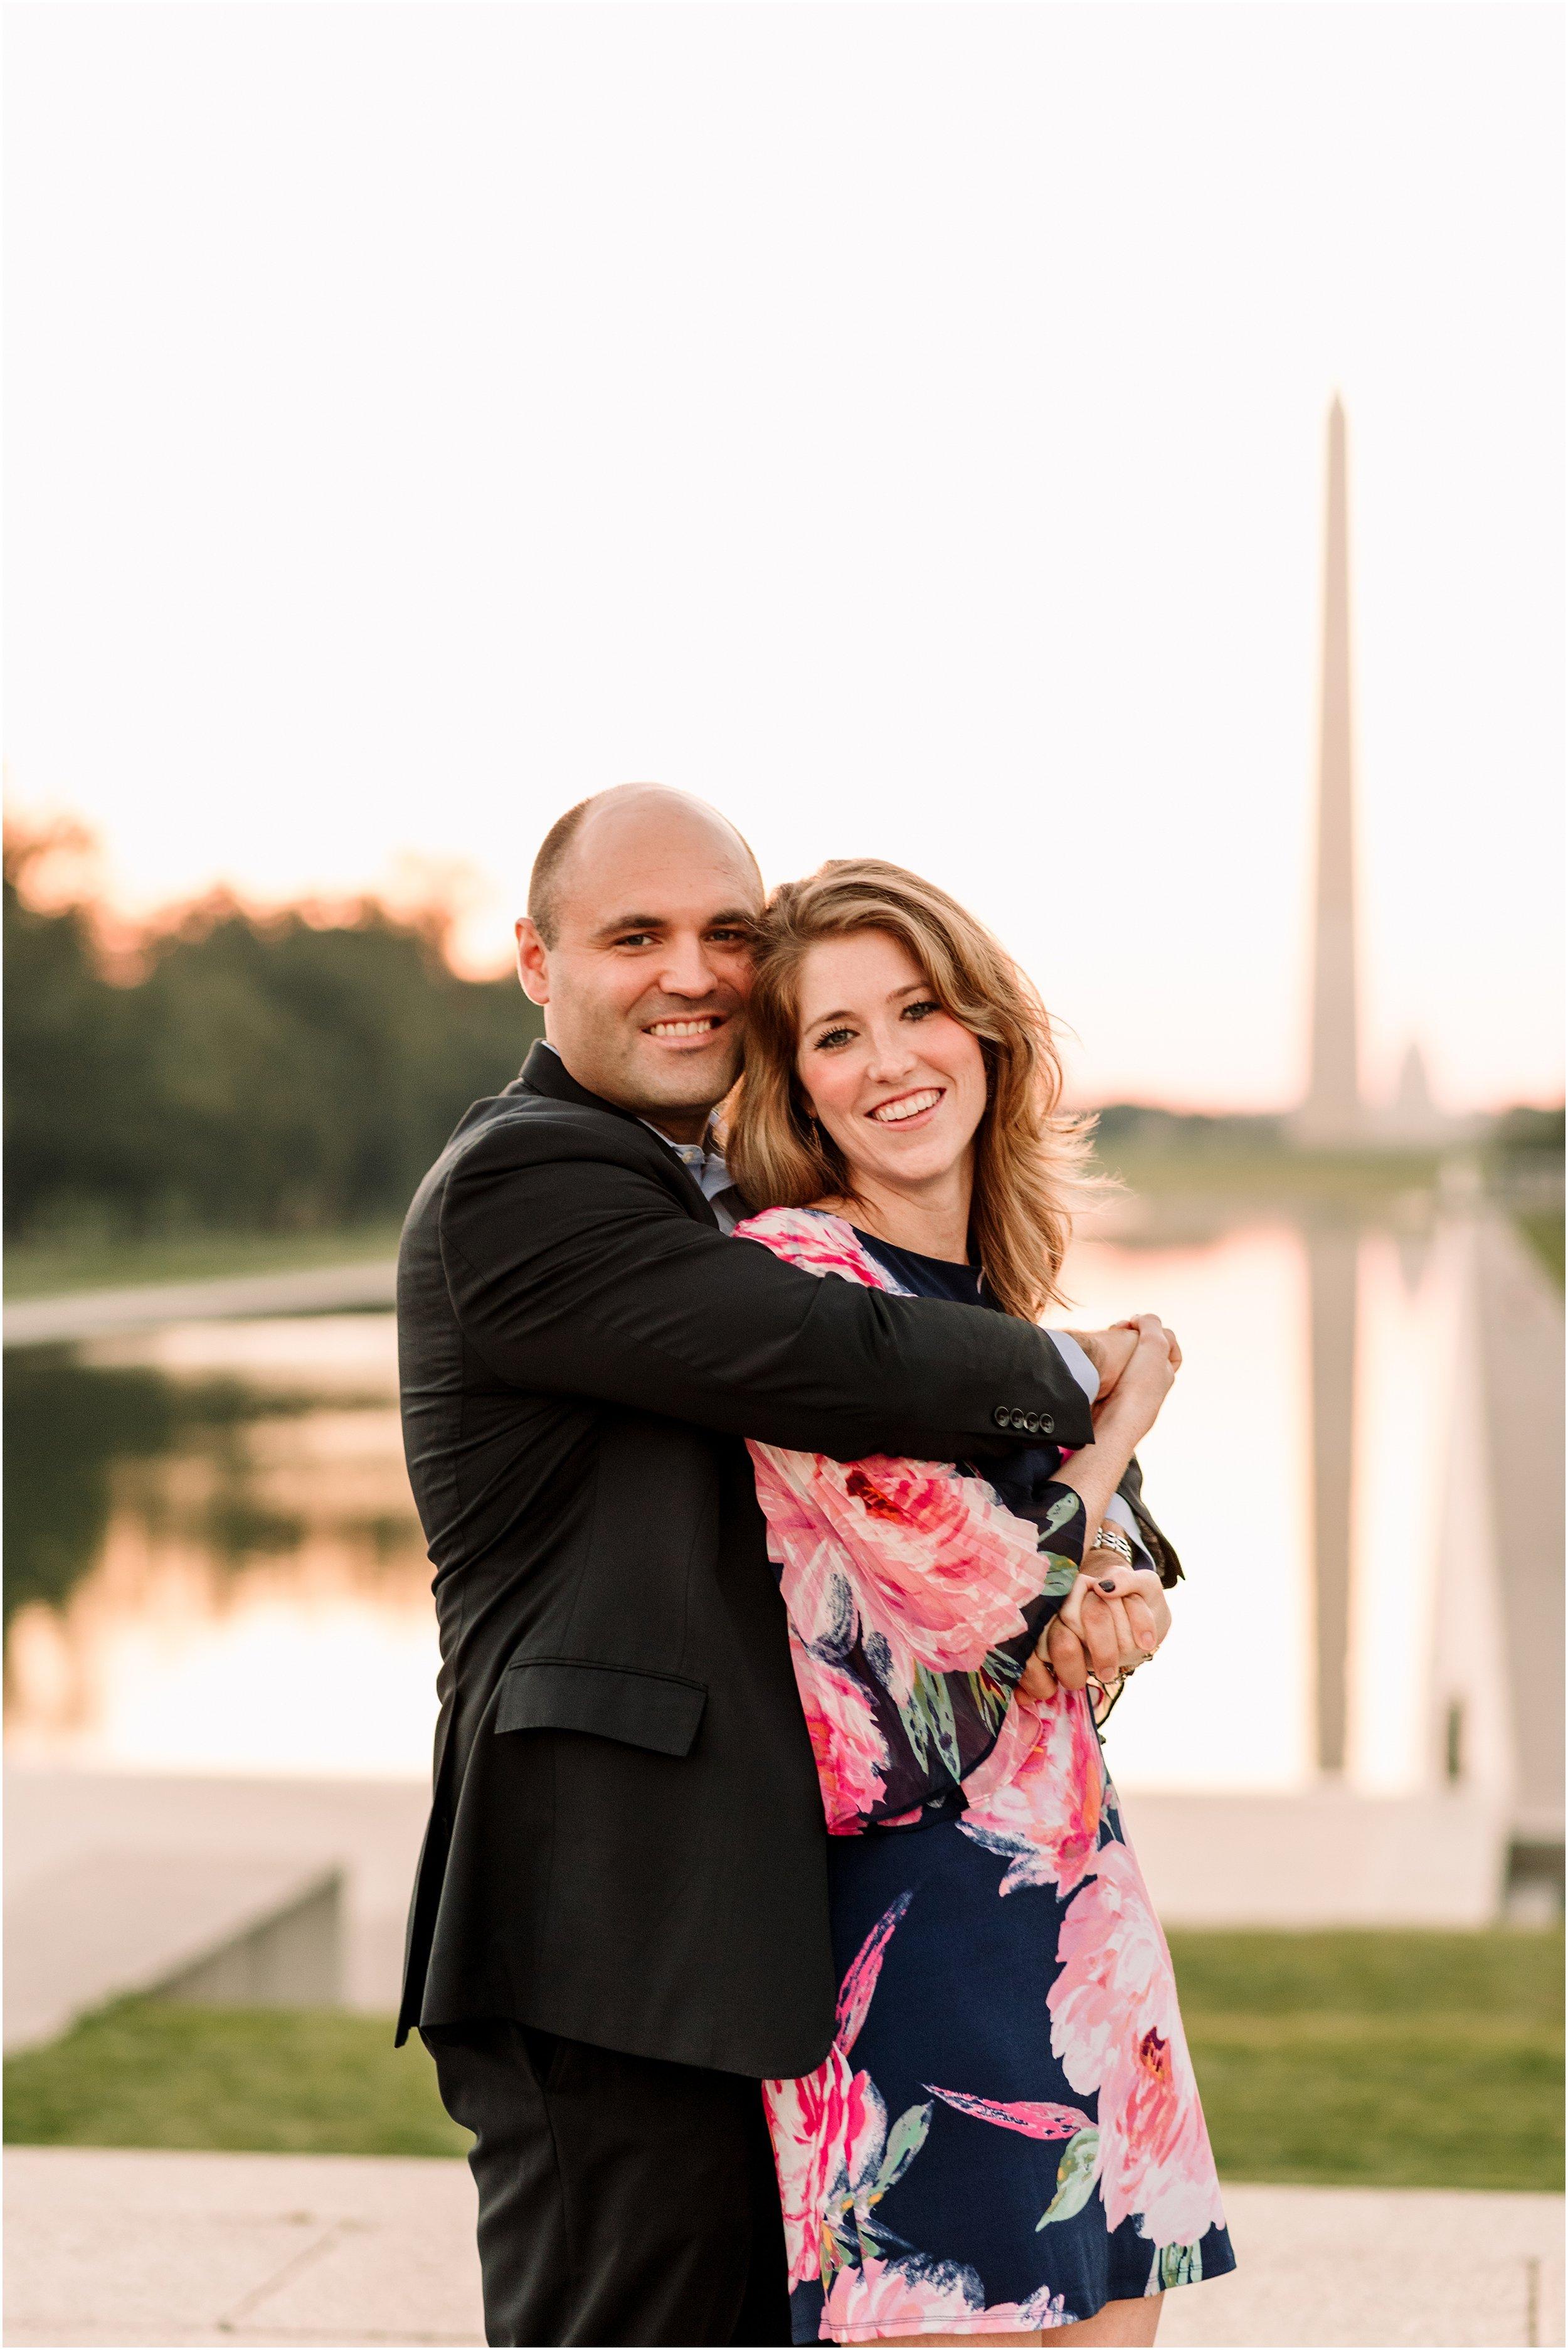 hannah leigh photography Sunrise Jefferson Memorial Engagement Session, Washington DC_1030.jpg